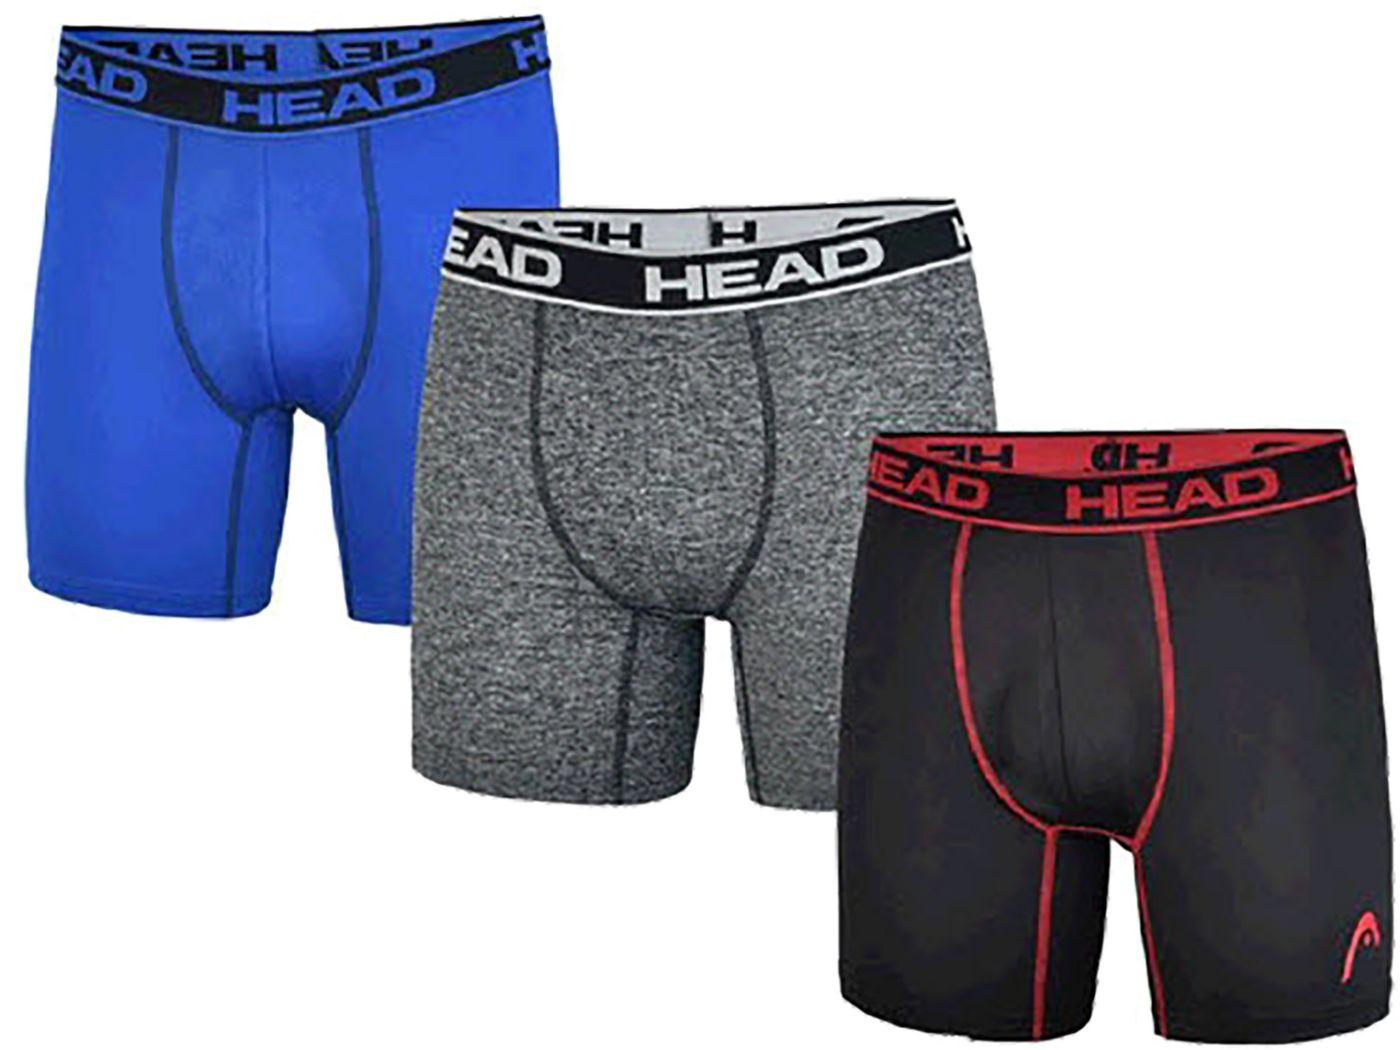 HEAD Men's Performance Boxer Briefs – 3 Pack